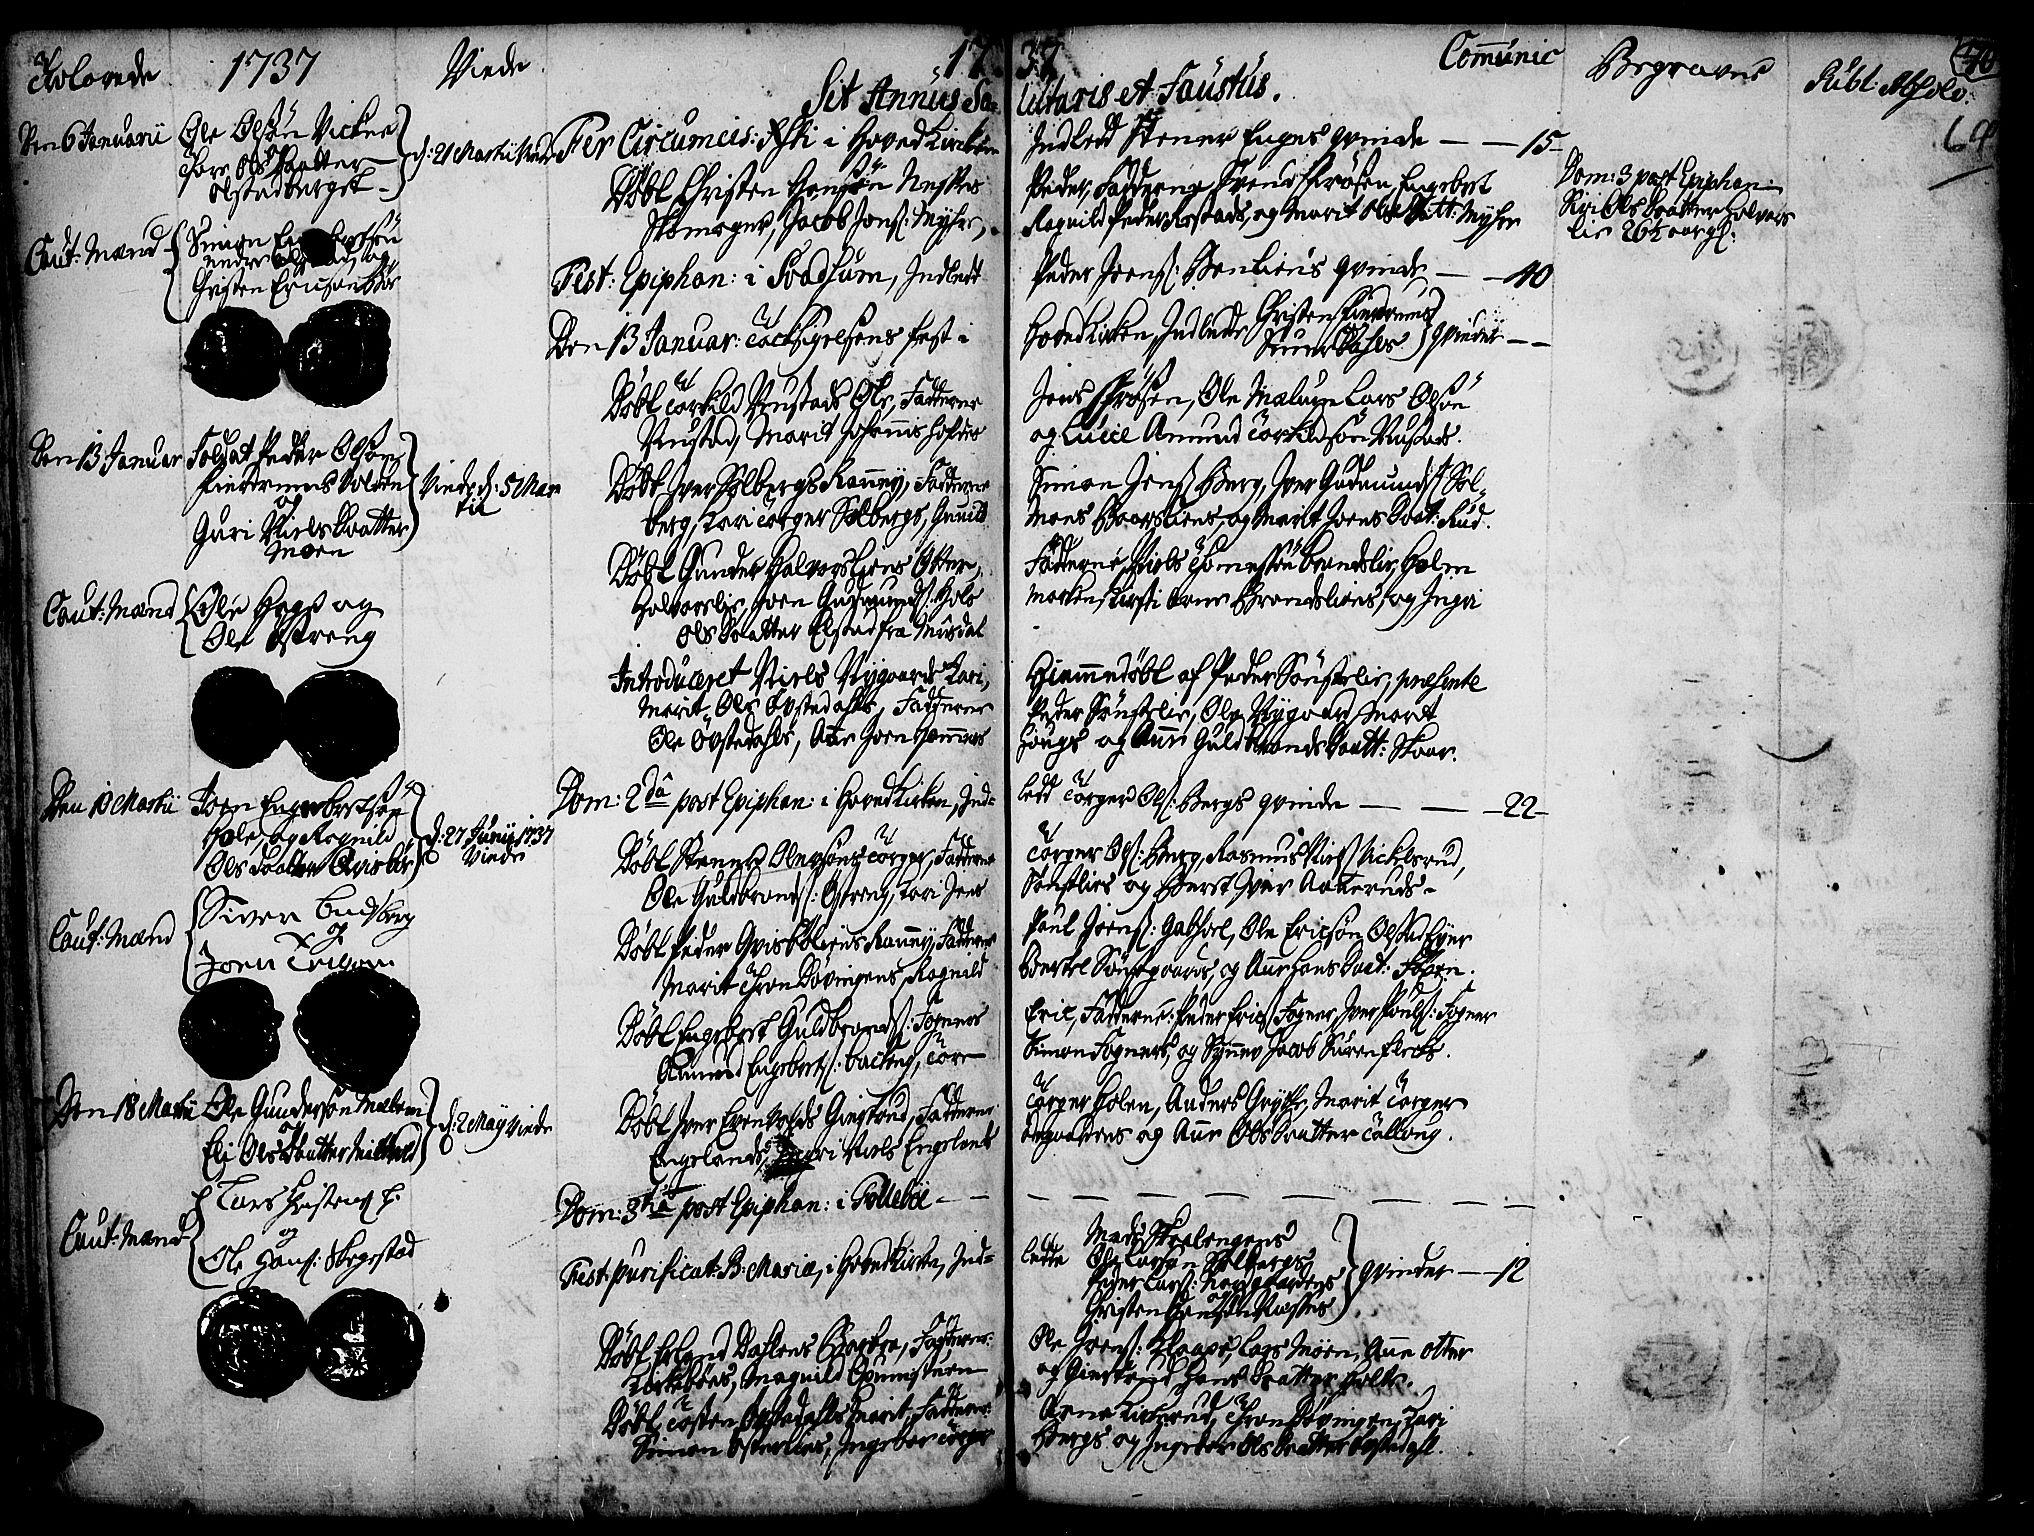 SAH, Gausdal prestekontor, Ministerialbok nr. 2, 1729-1757, s. 64